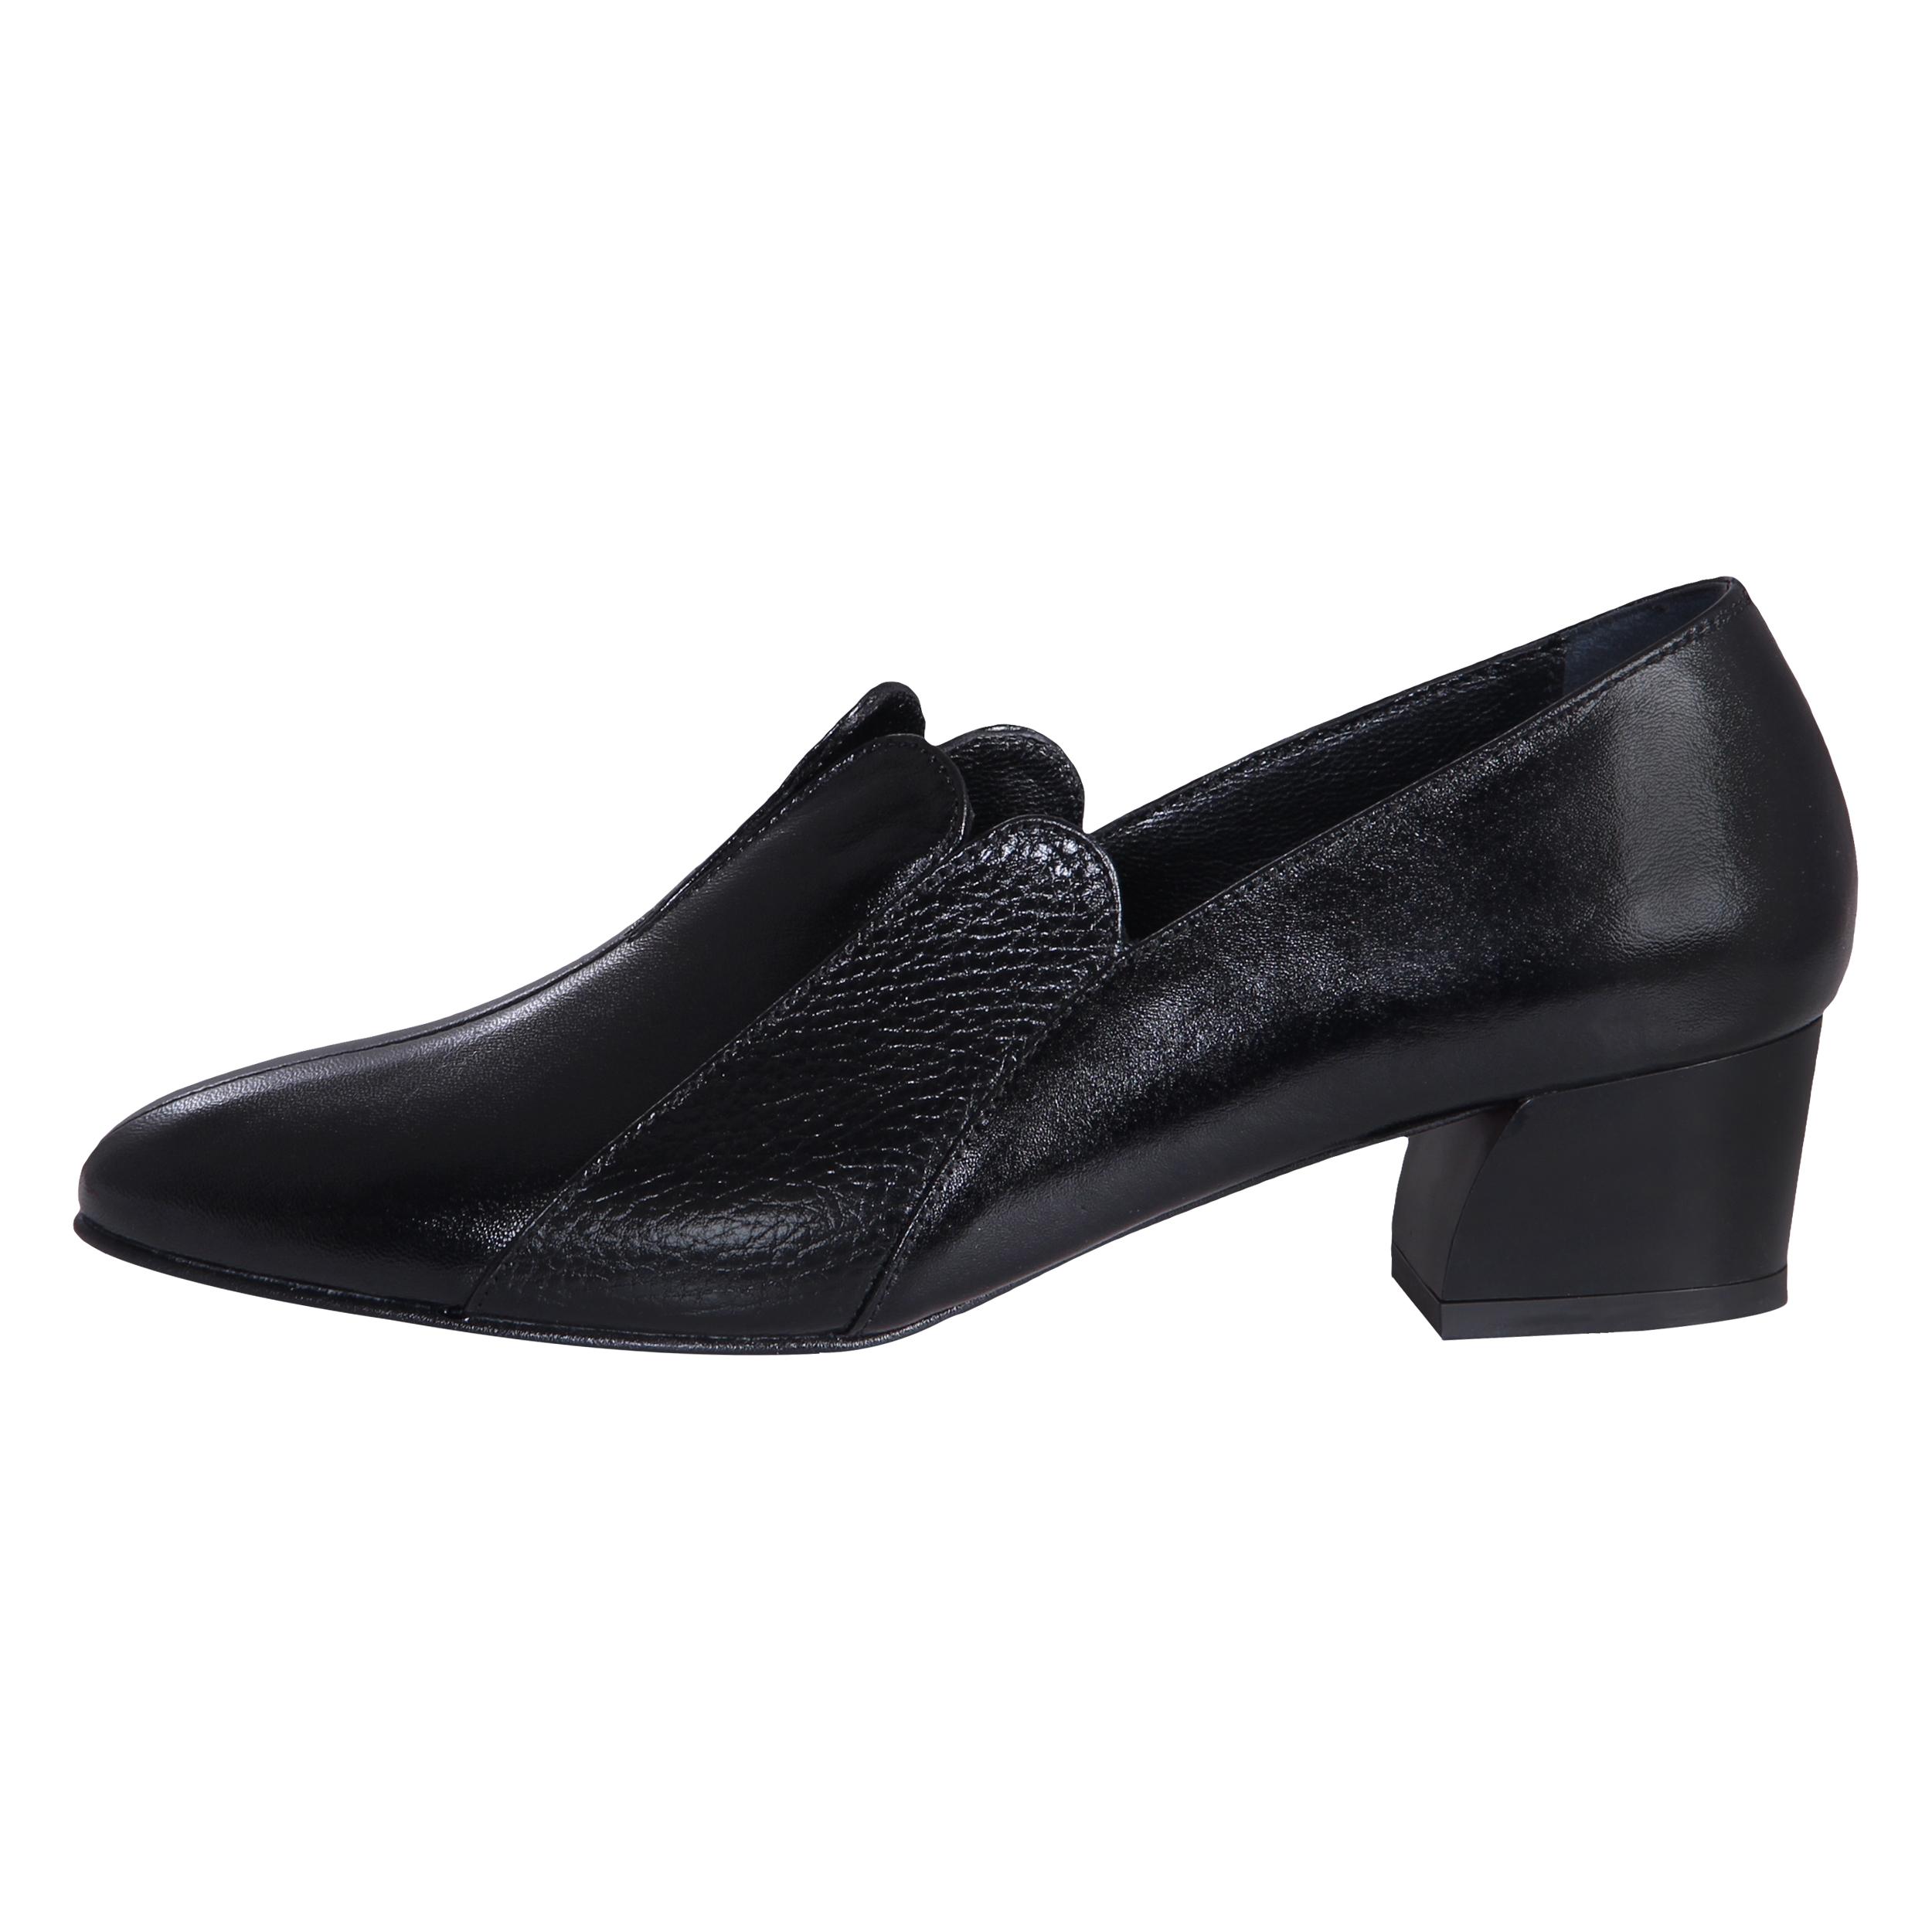 کفش زنانه شهر چرم کد 1-39969